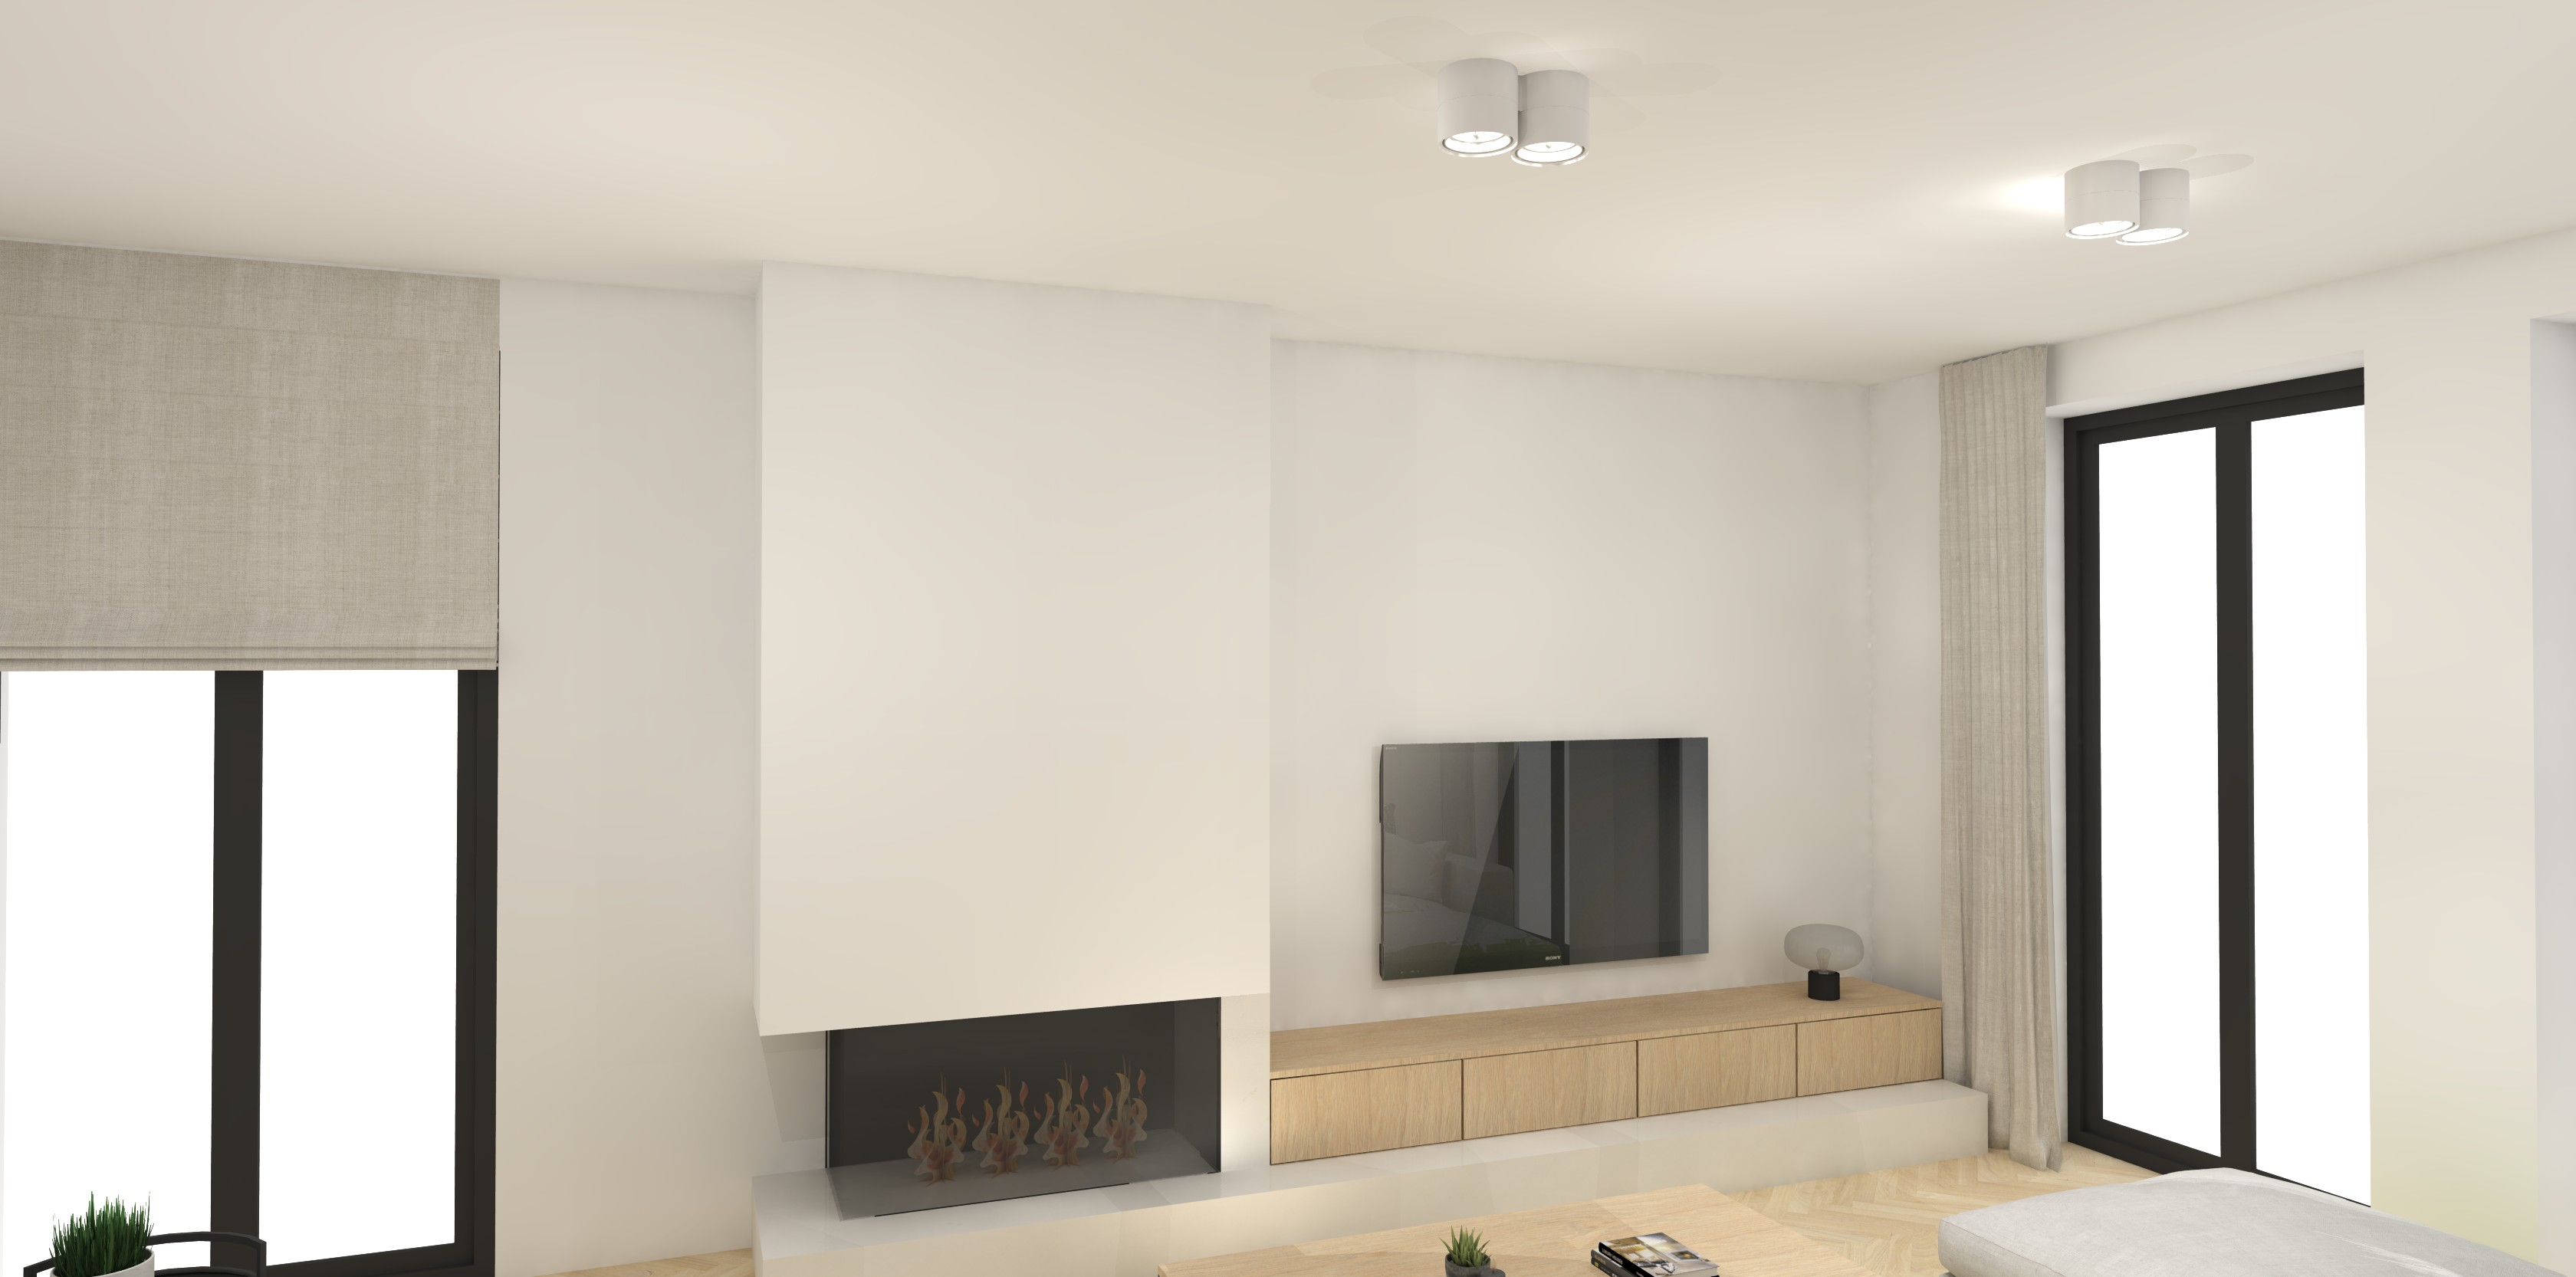 interieurarchitectuur nieuwbouw woonkamer